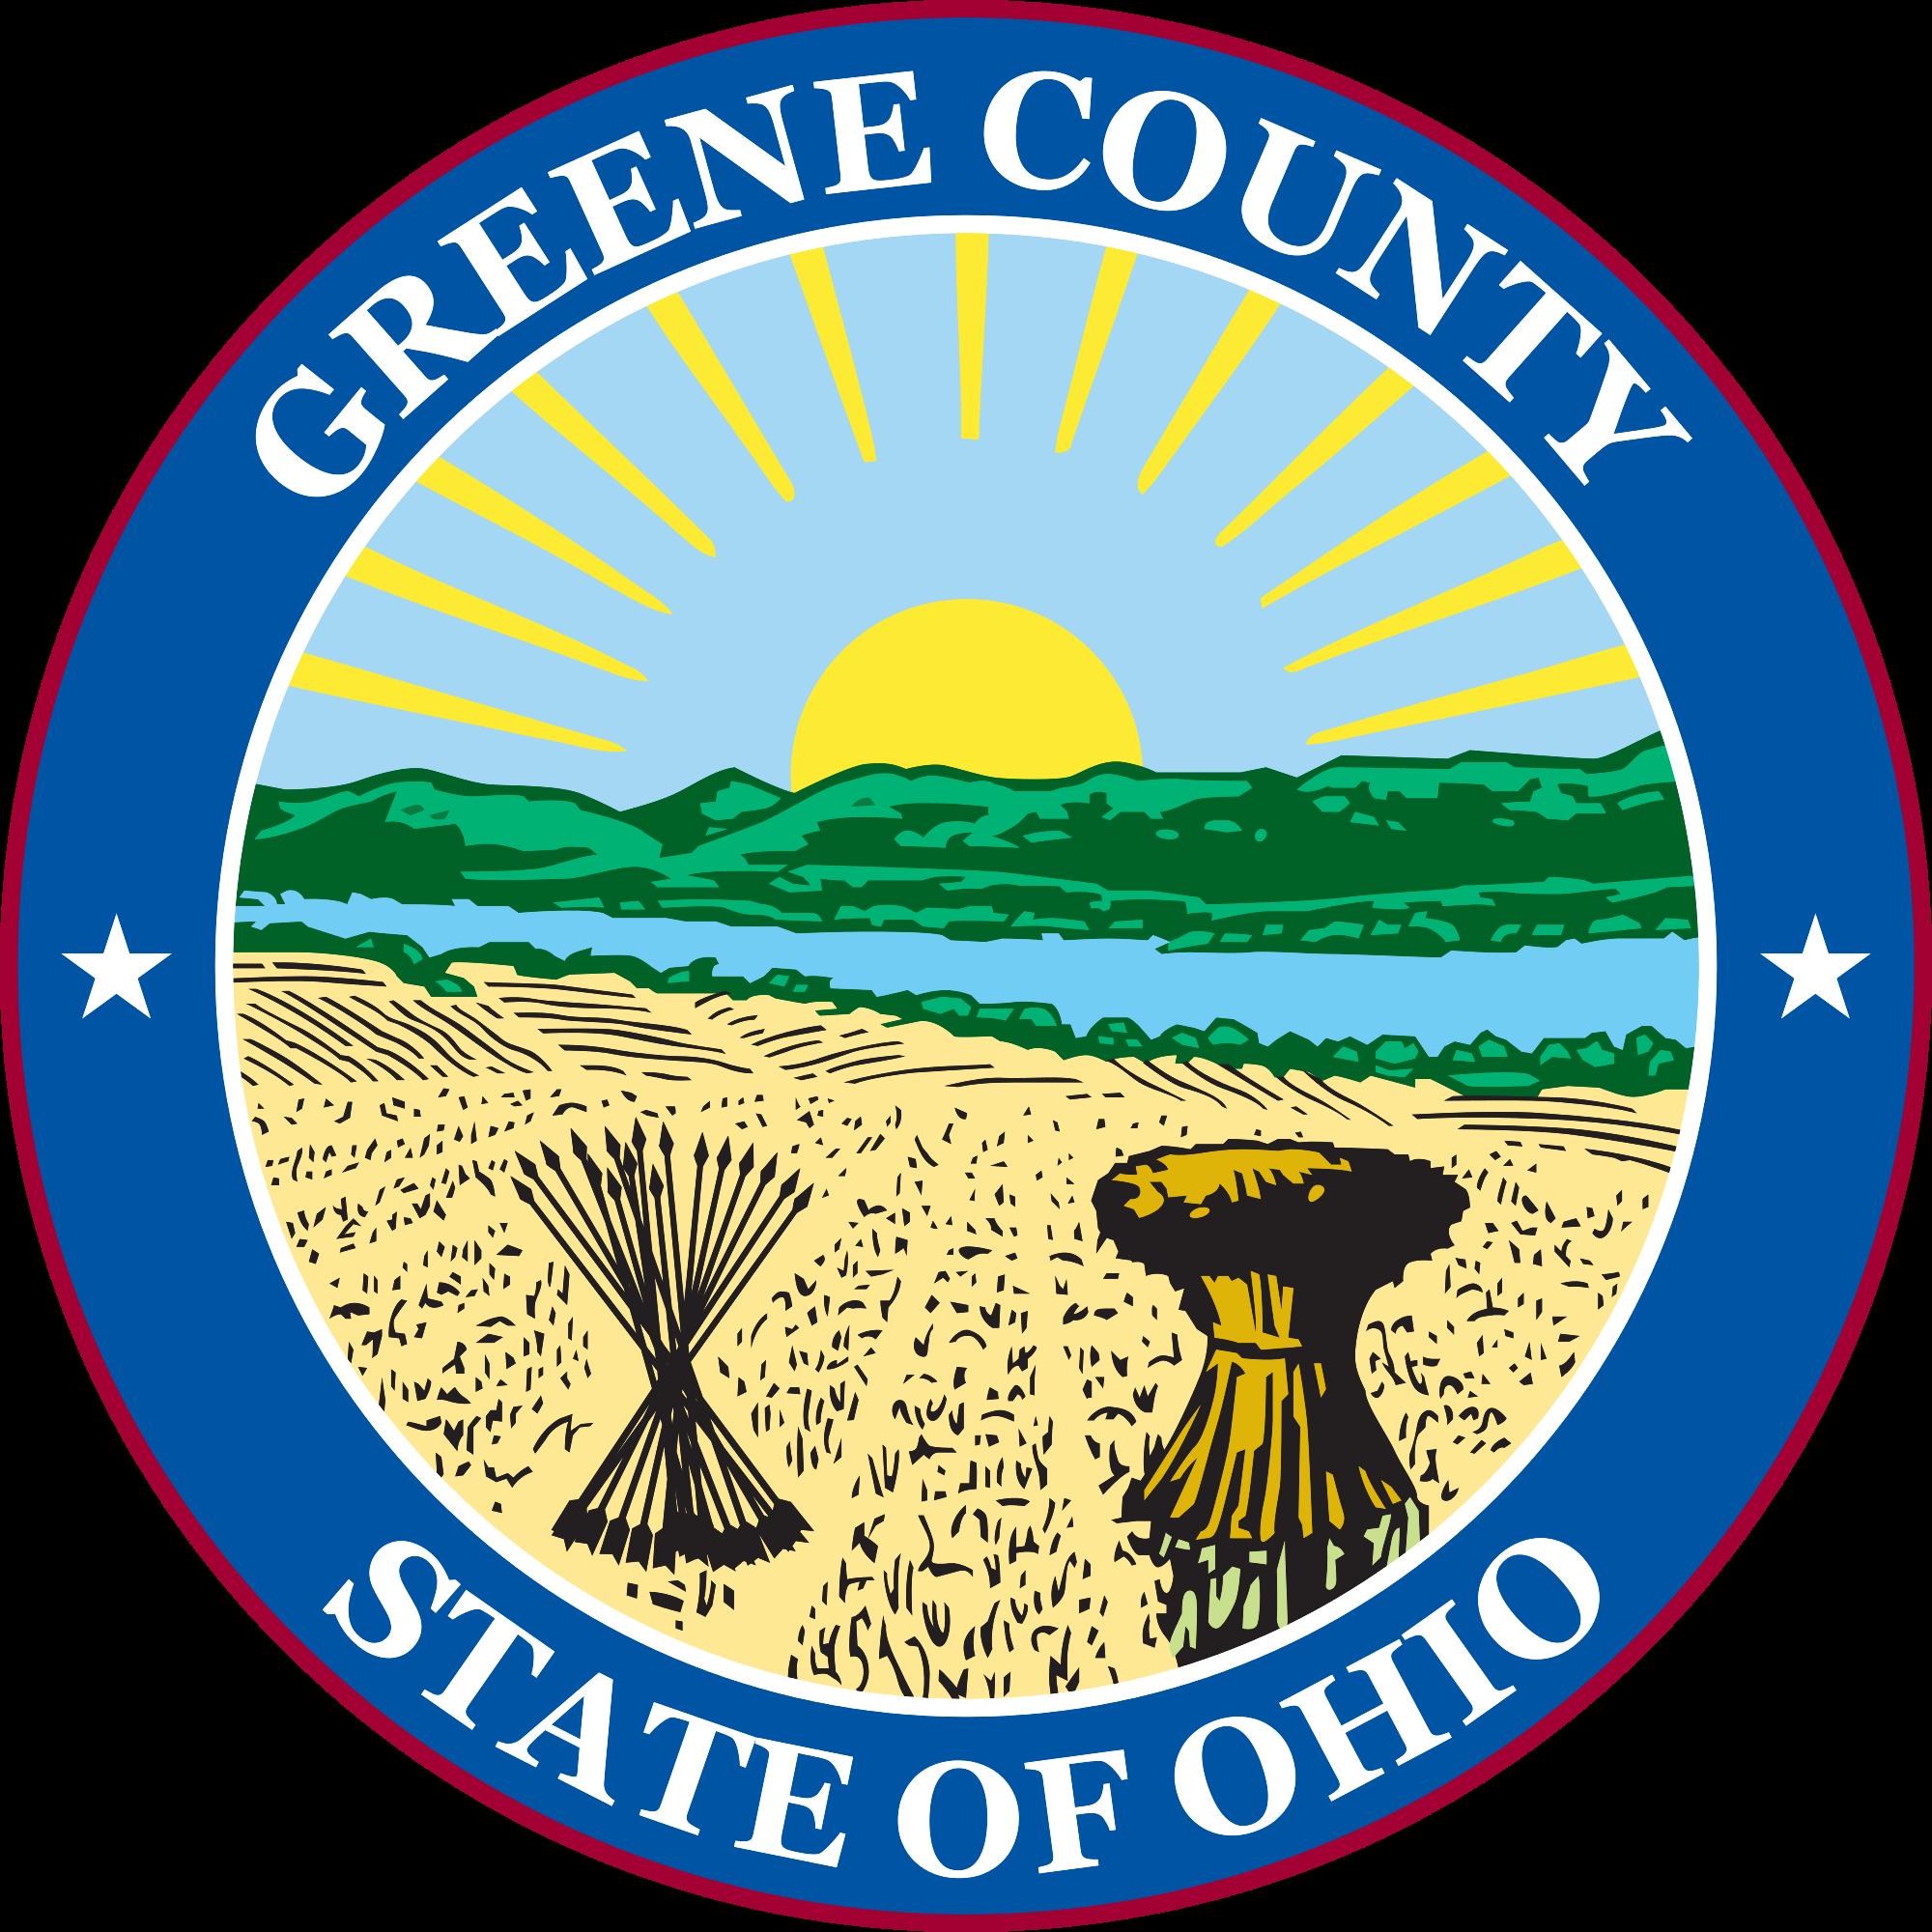 File:Seal of Greene County Ohio.svg.